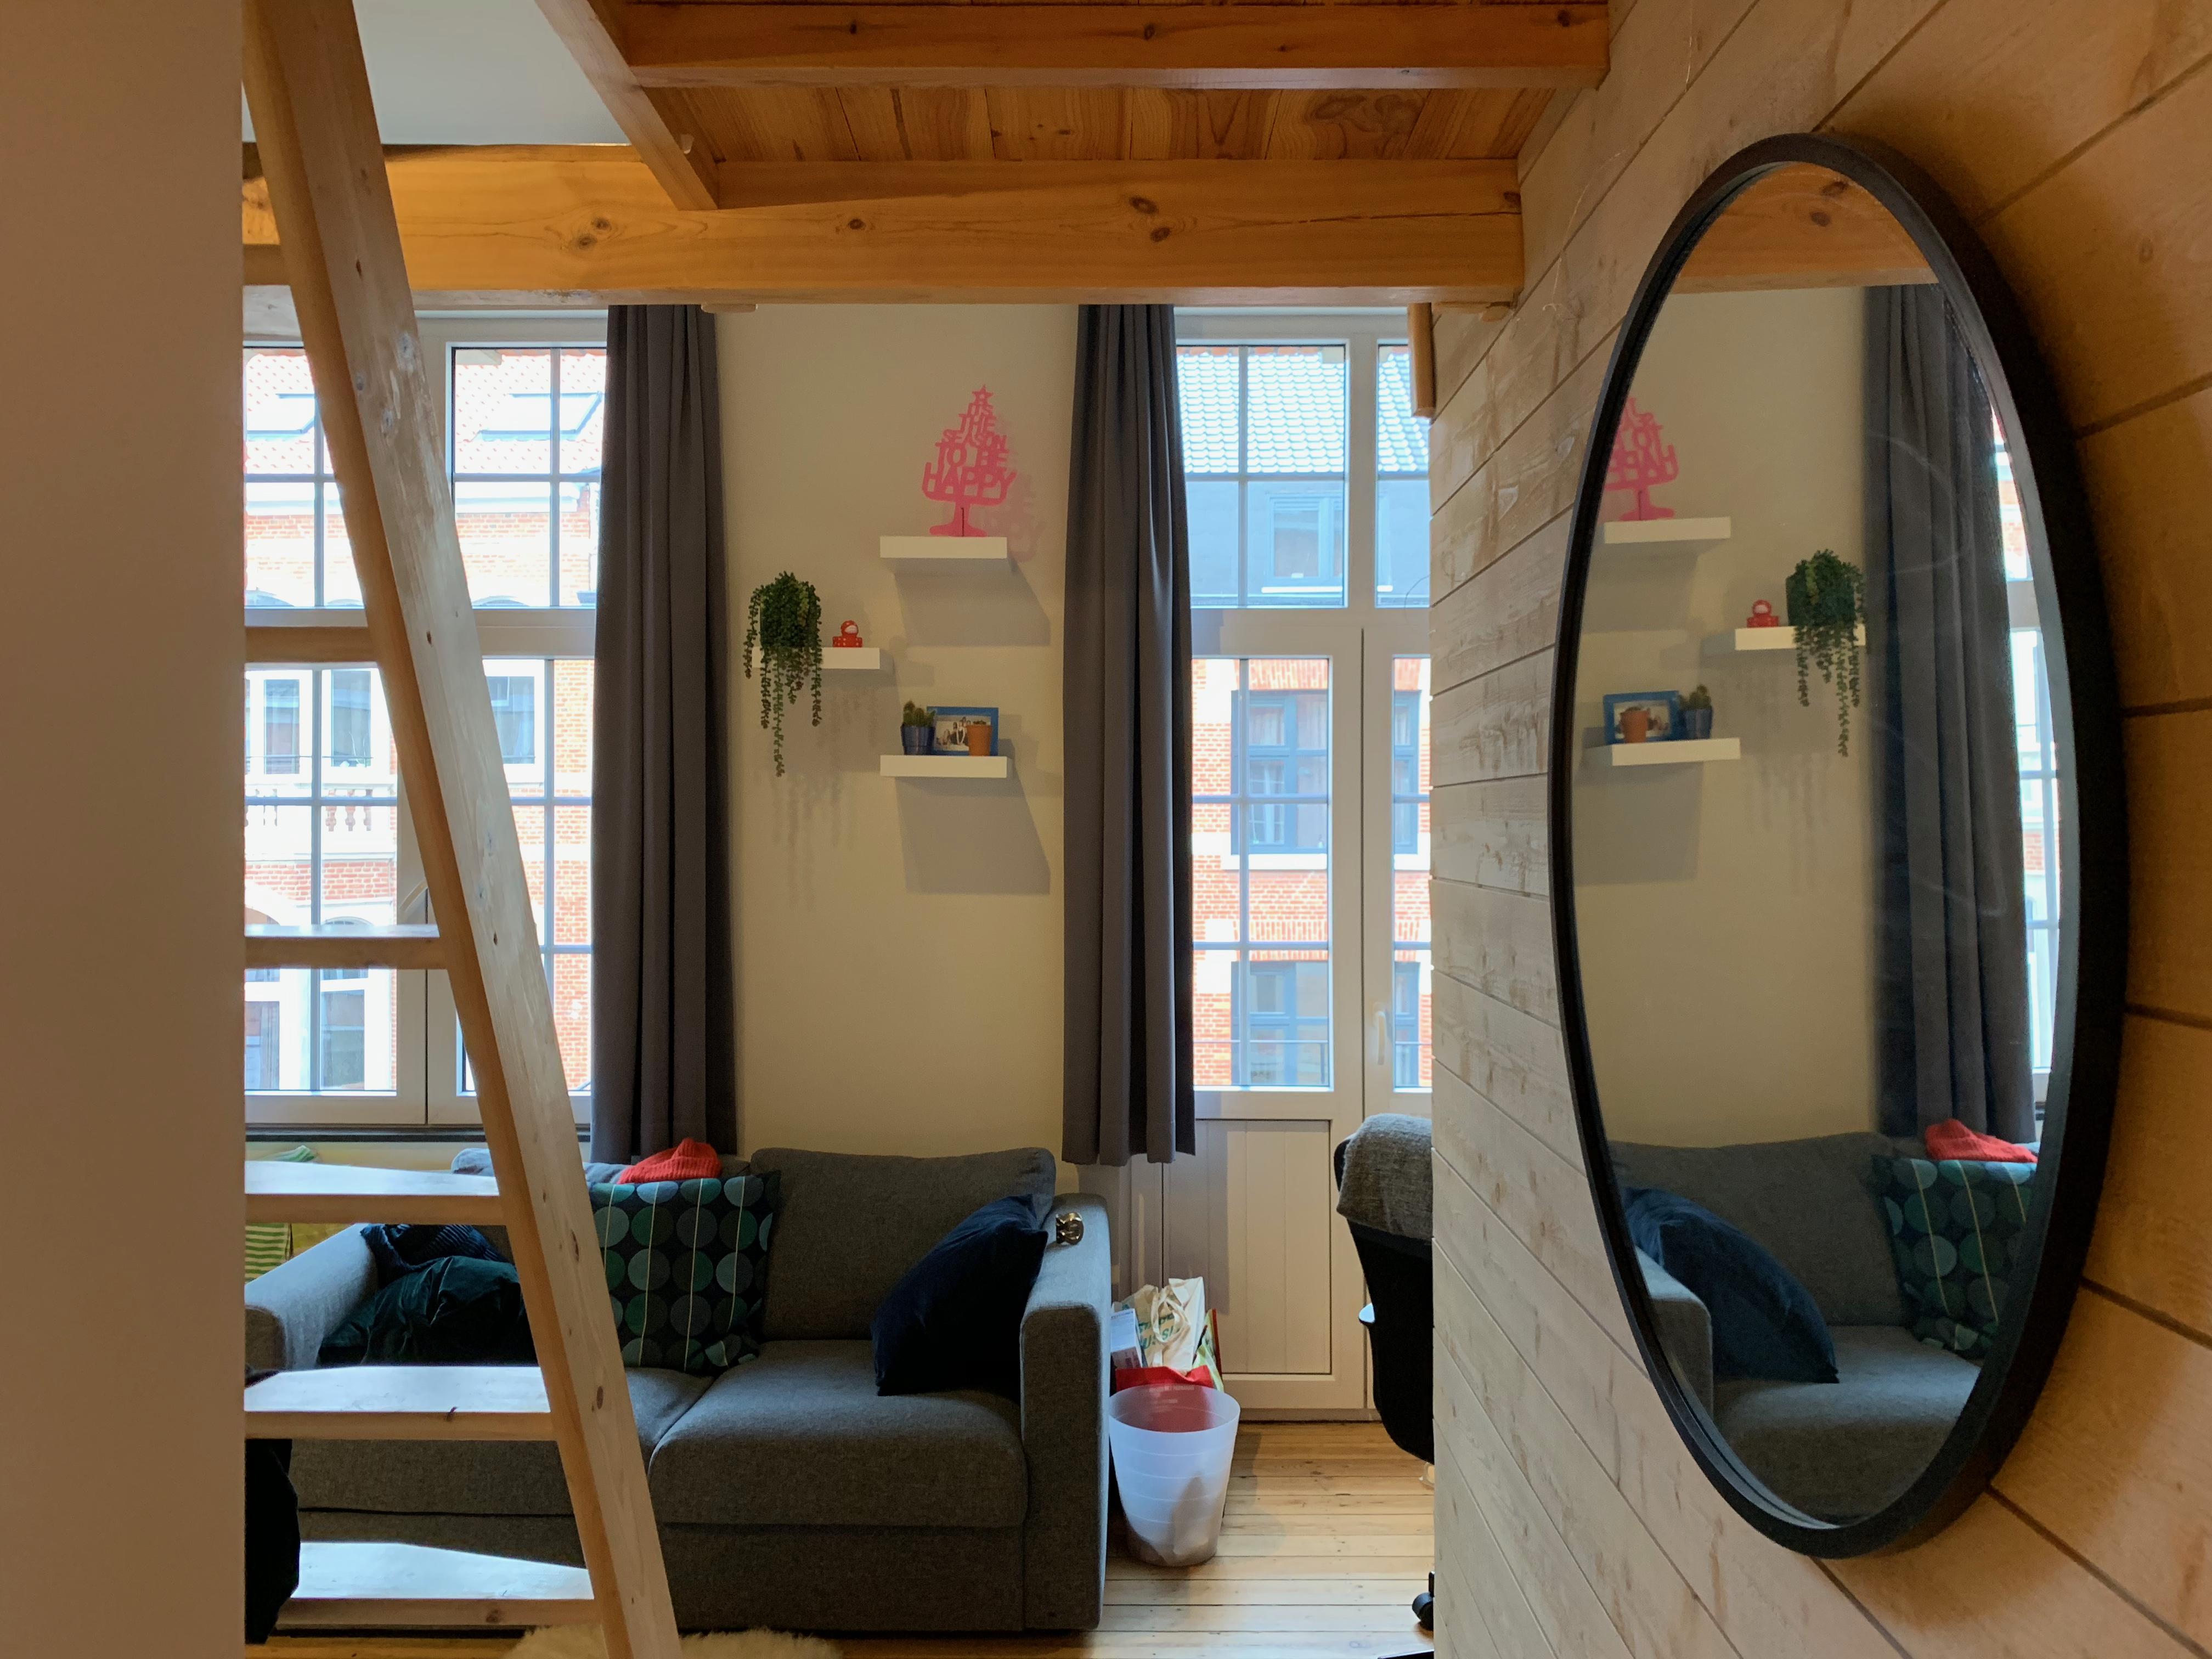 DB5-0202 - spiegel, ramen